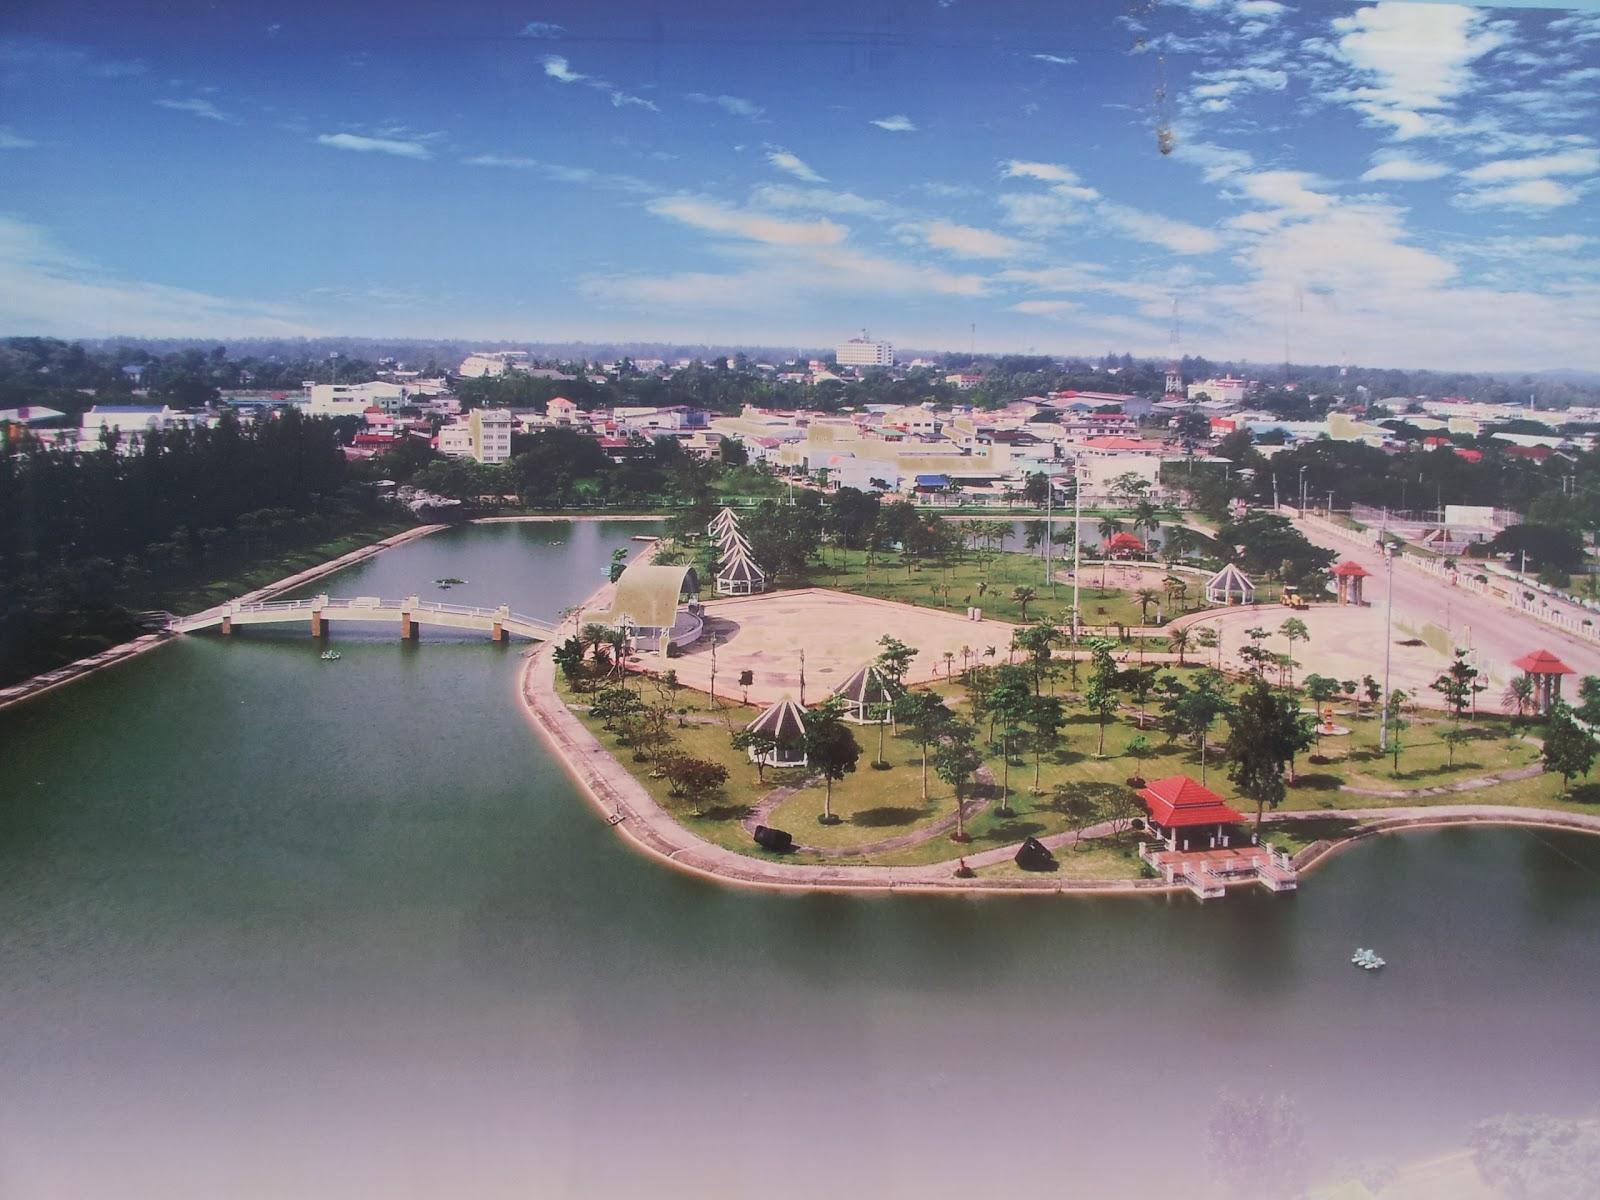 Hotel Isan Isaan Life Golden Jubilee Commemoration Park Mukdahan Thailand